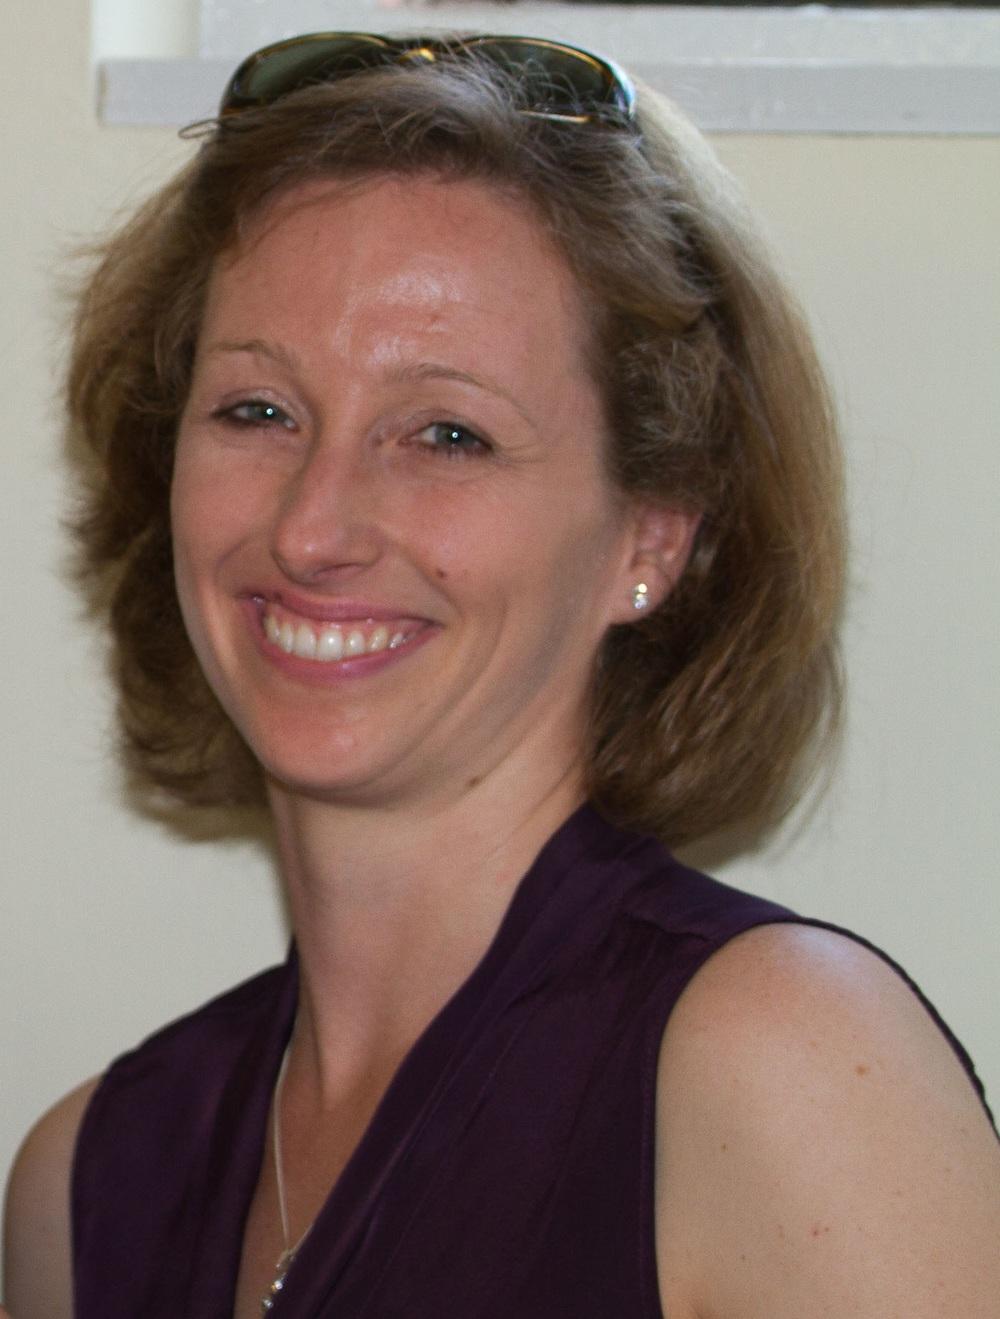 Tara McIndoe Calder (Zimbabwe & Hertford 2006)